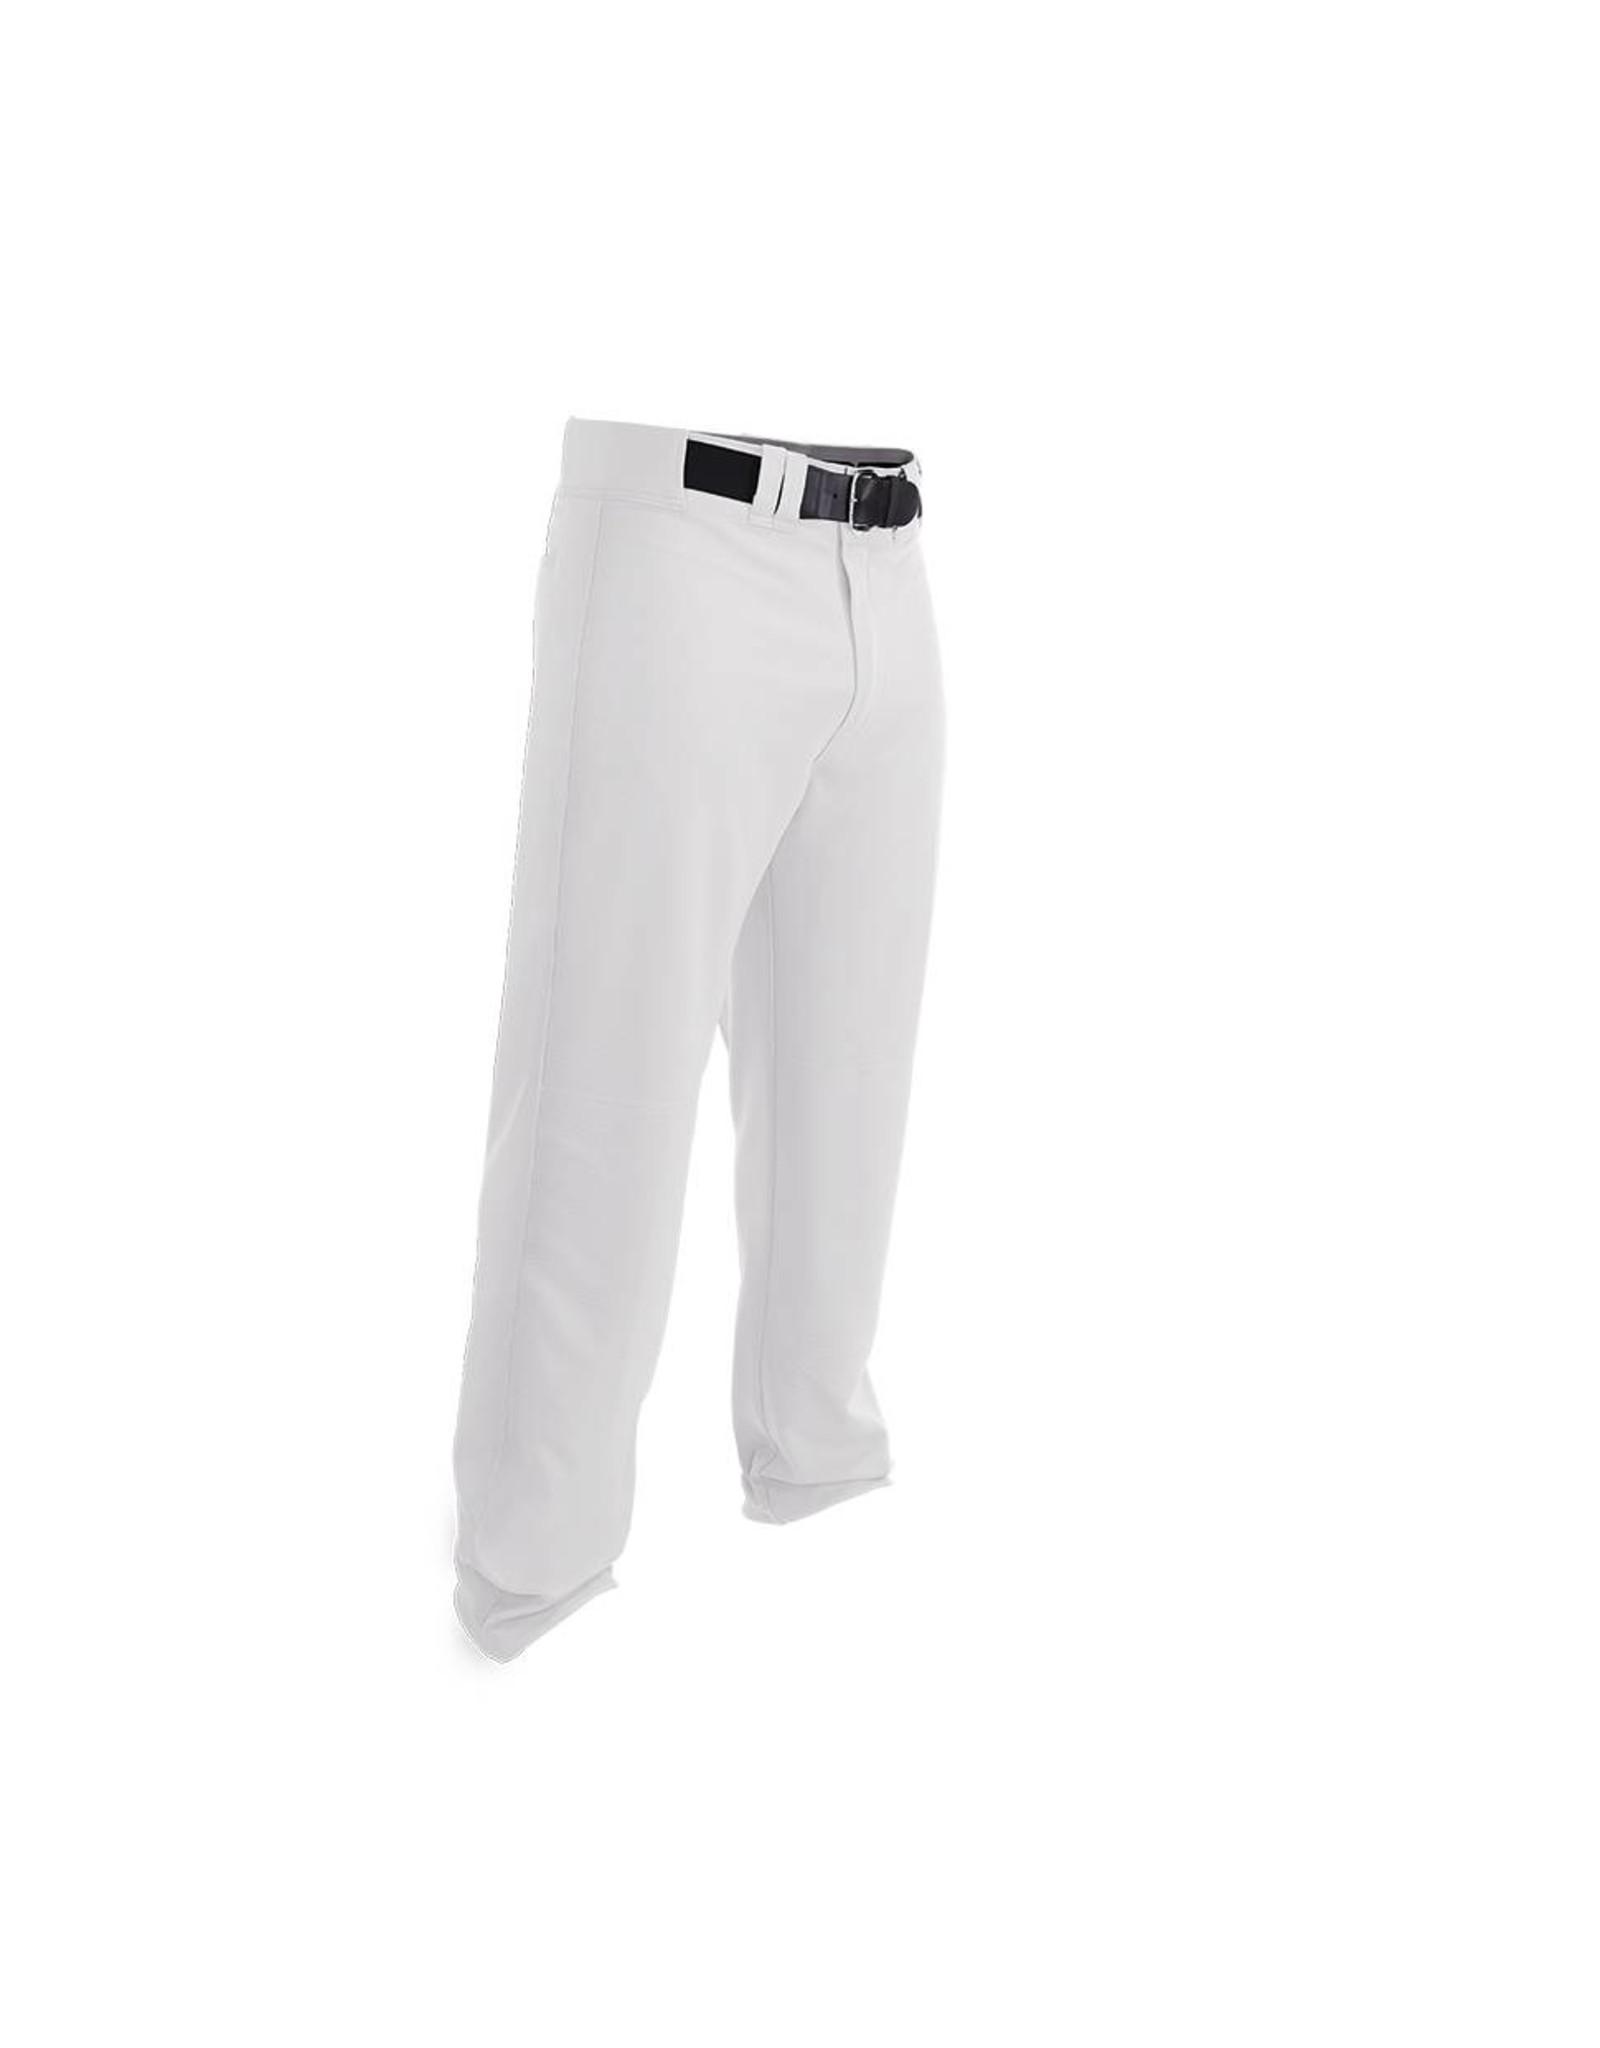 EASTON- Pantalon RIVAL